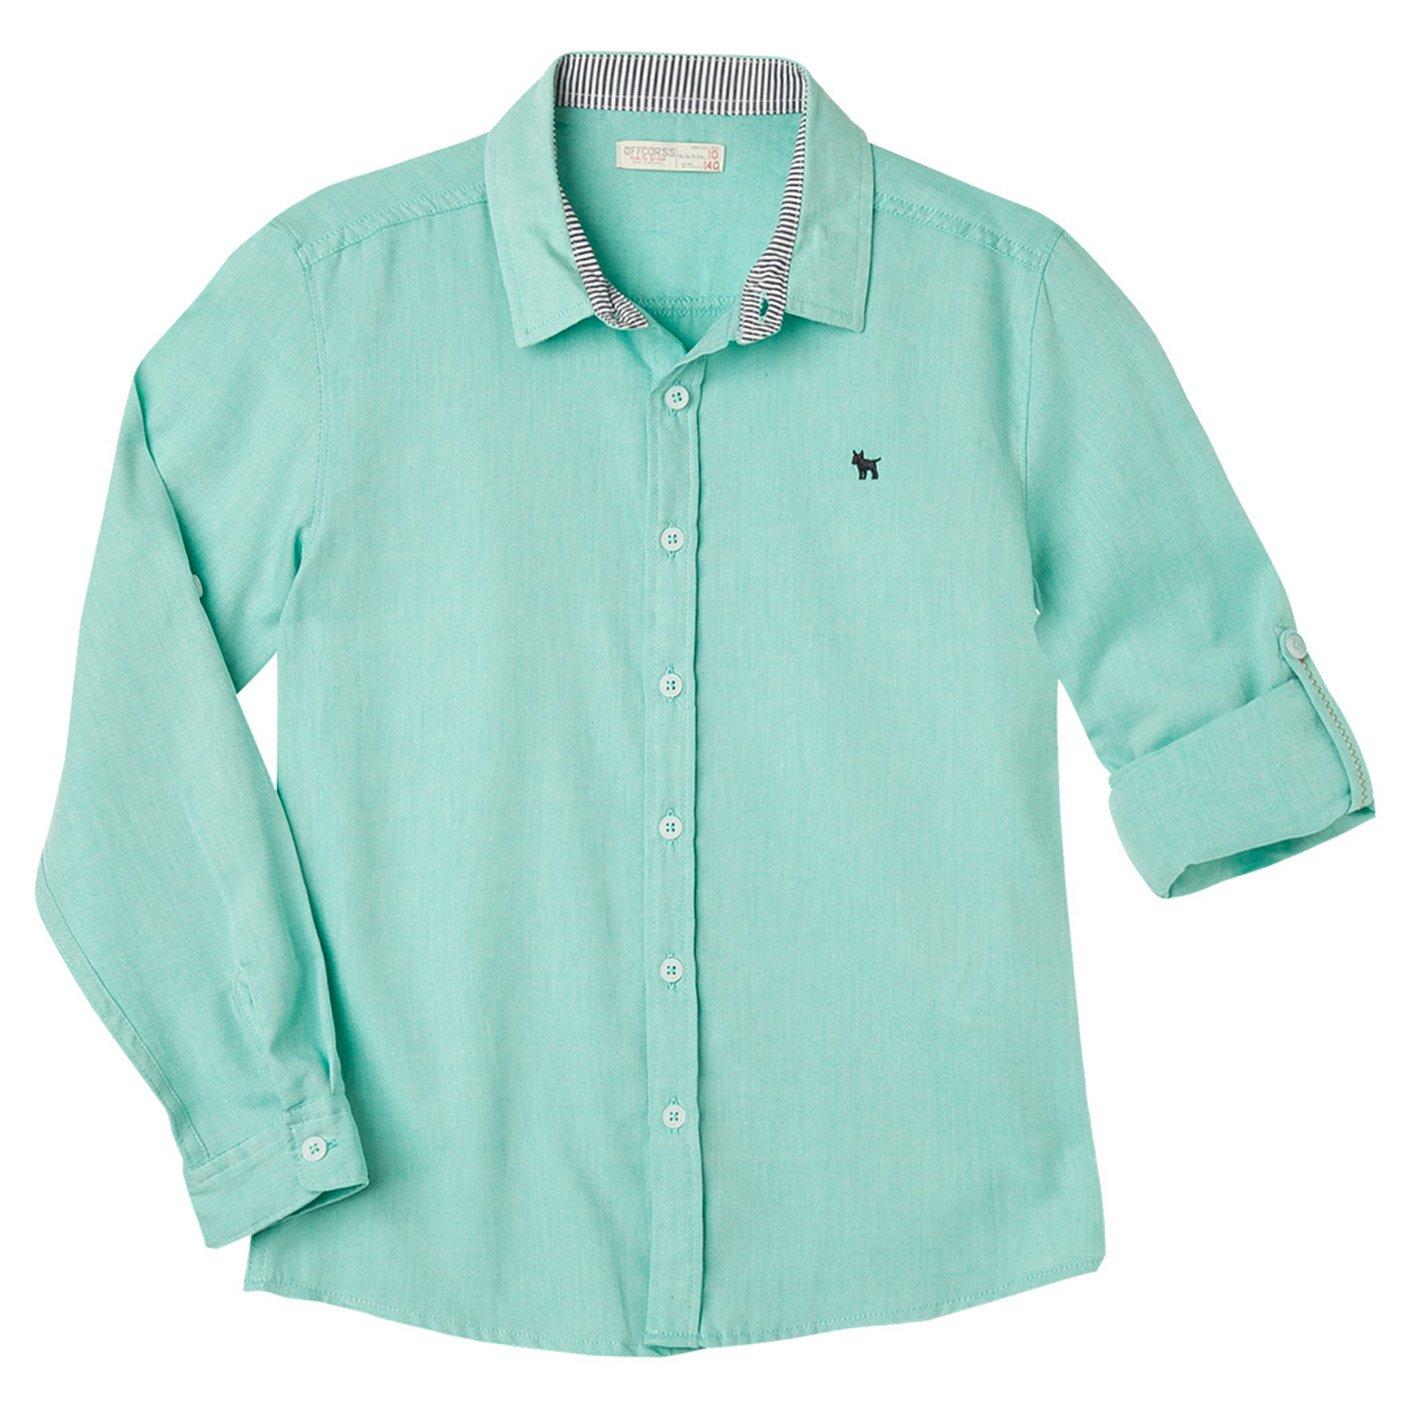 OFFCORSS Big Boys Long Sleeves Solid Colors Dress Button Down Slim Fit Cotton Dressy Shirt Collared Camisa Manga Larga de Vestir Niño Grande Green 6